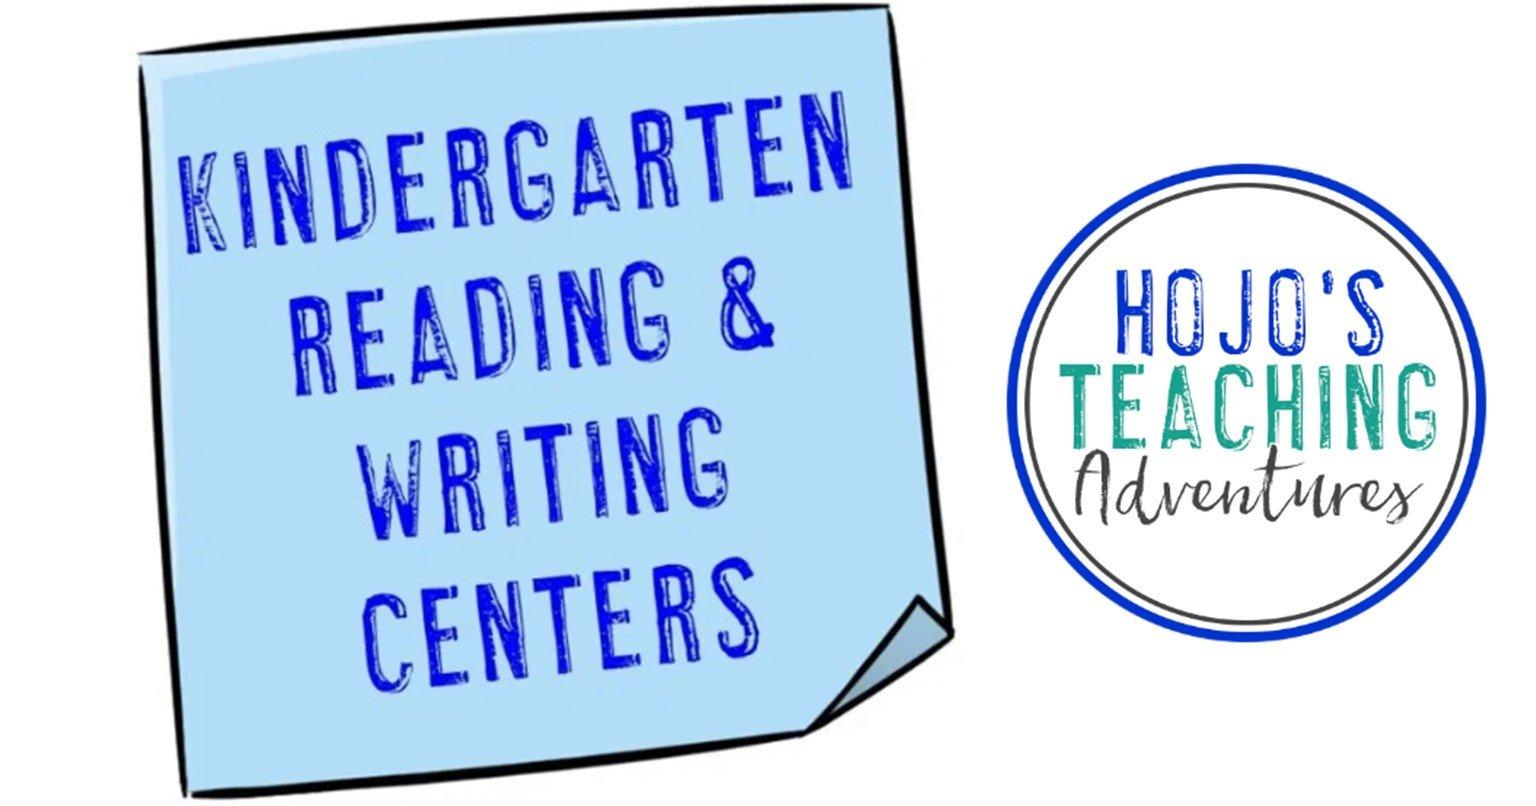 kindergarten reading & writing centers